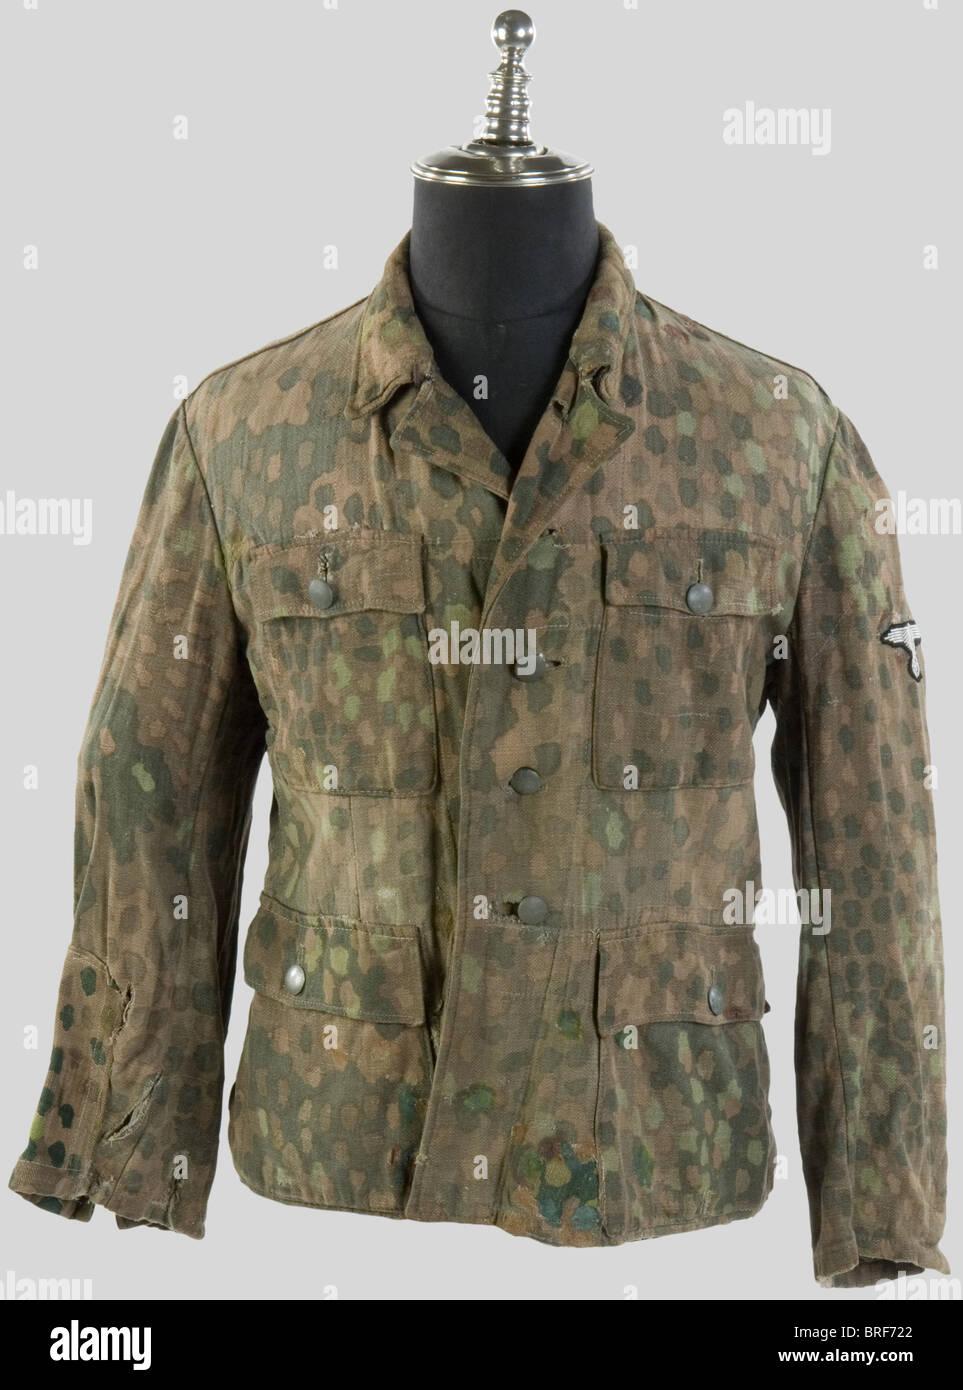 Camouflage Dit Schutzstaffel La Waffen De Ss Veste Camouflé xqqzg0YO